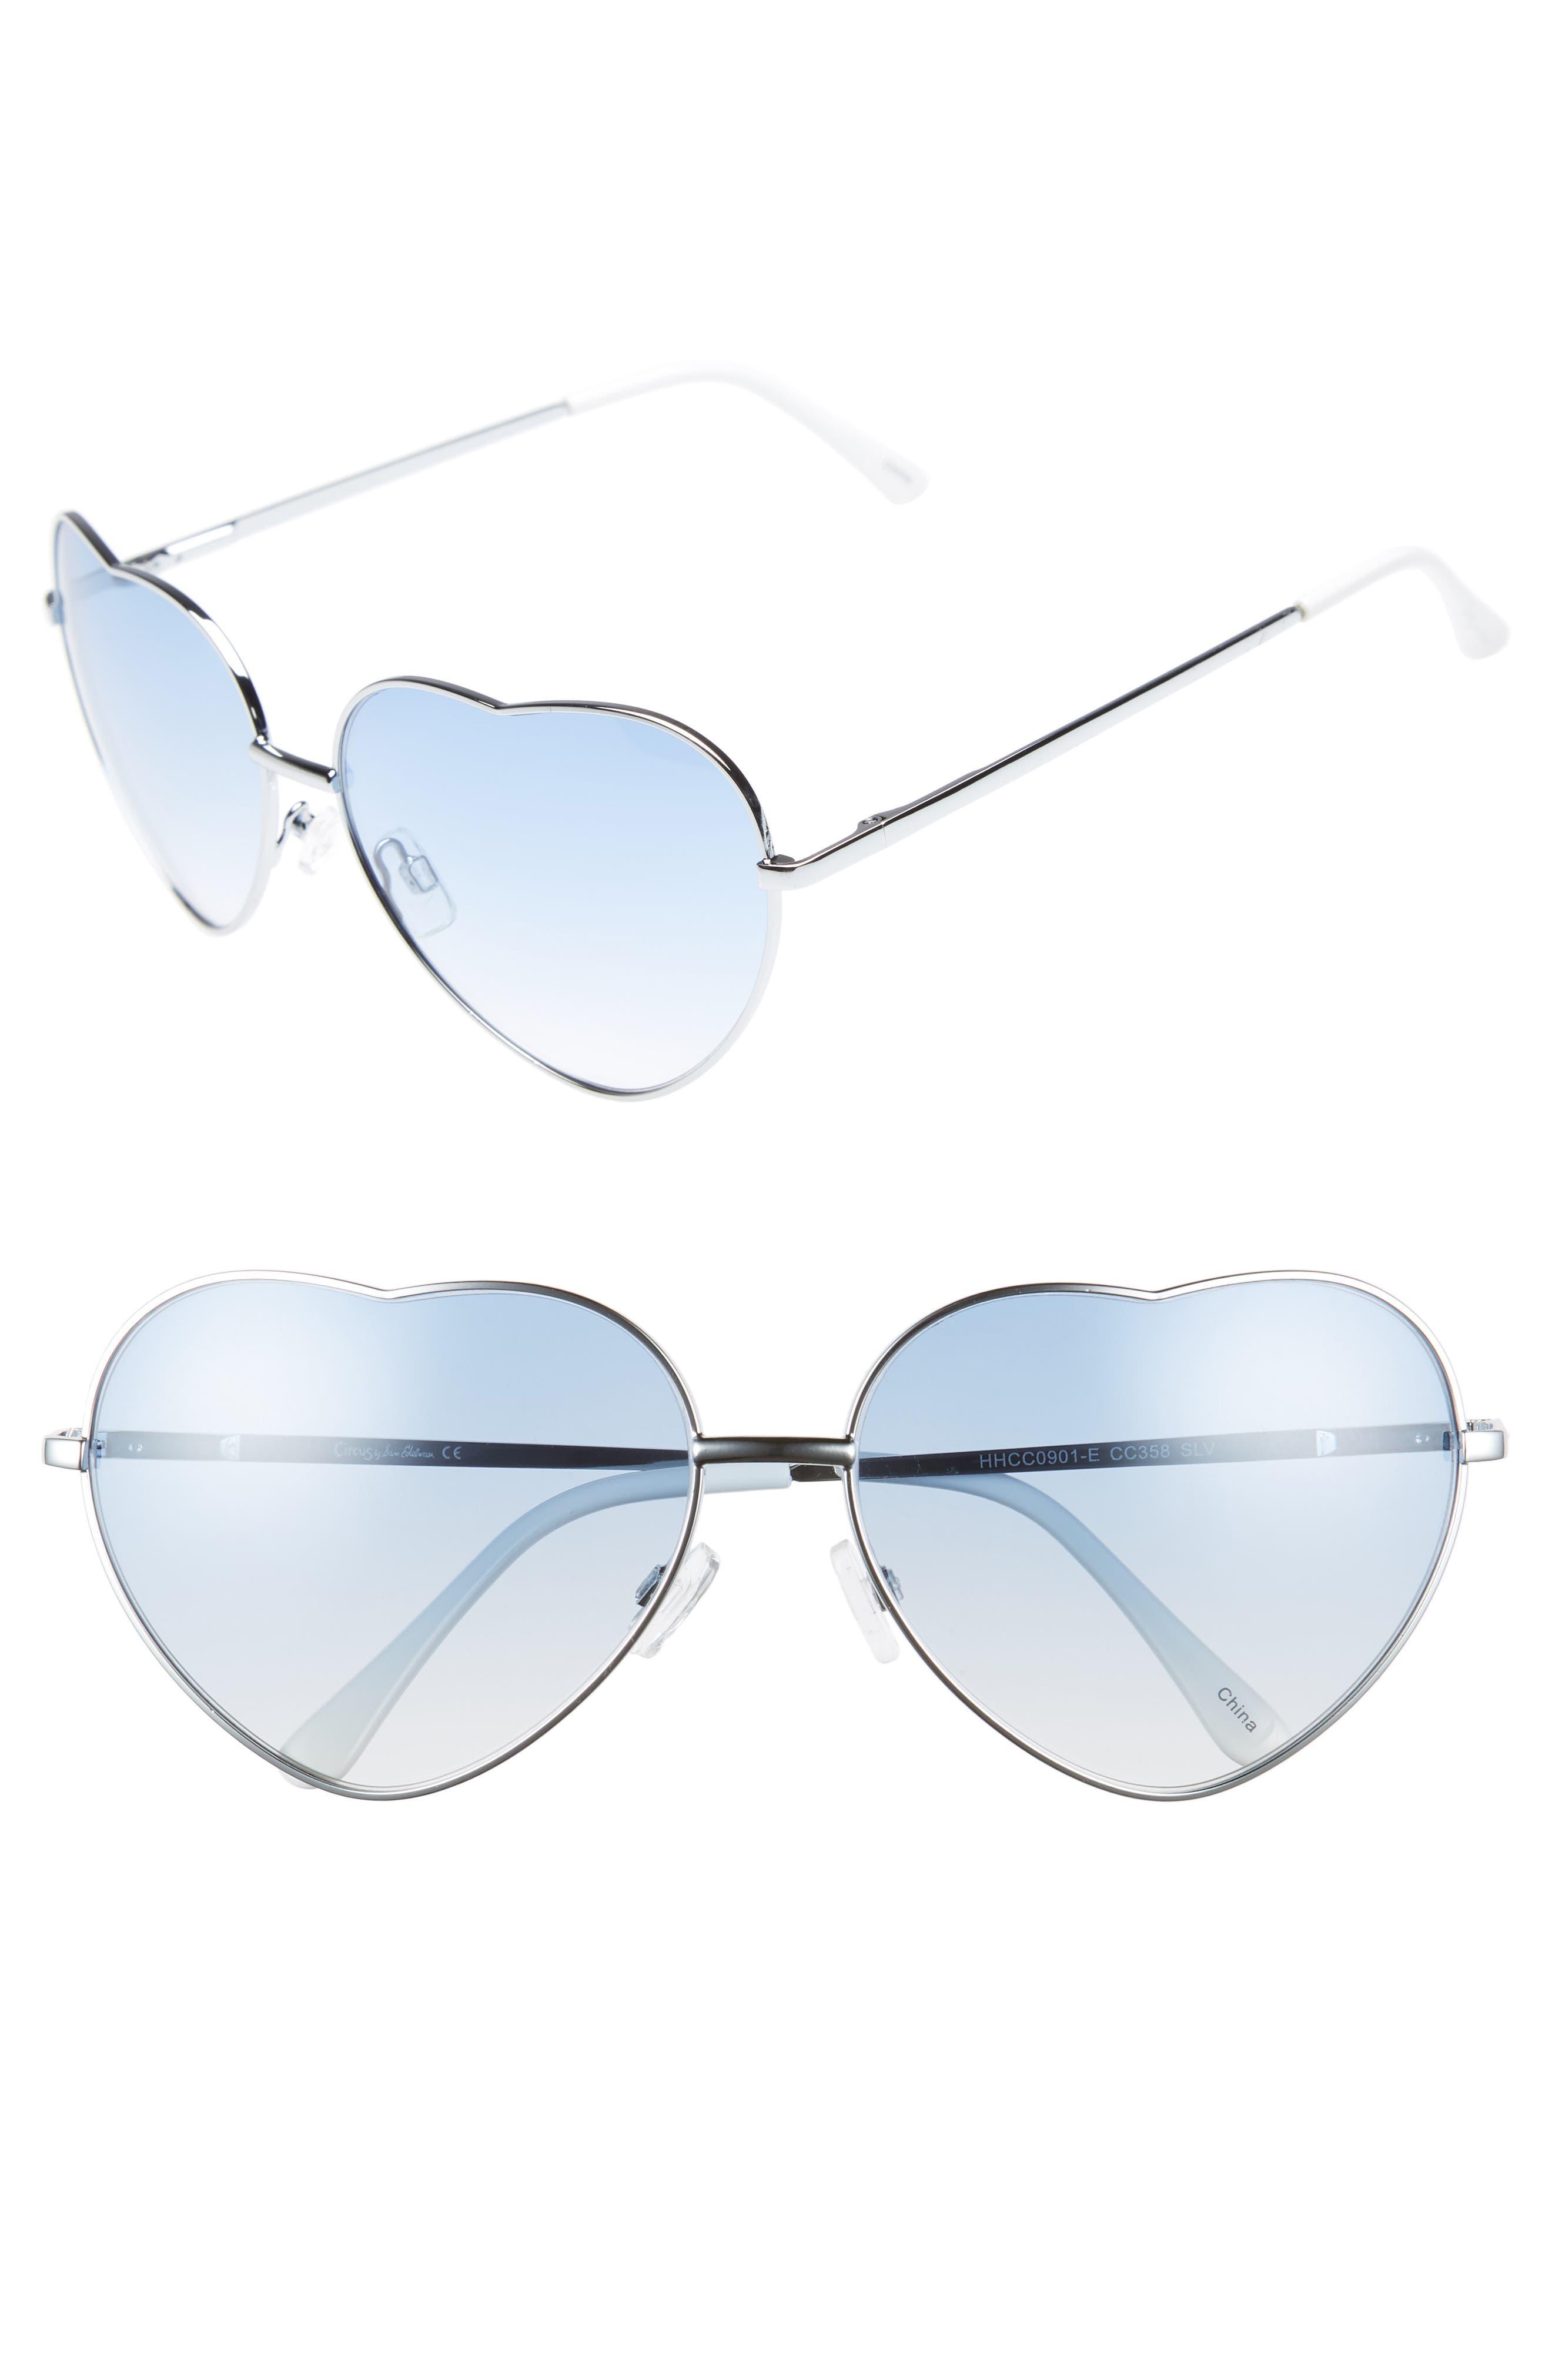 60mm Metal Heart Sunglasses,                             Main thumbnail 1, color,                             040